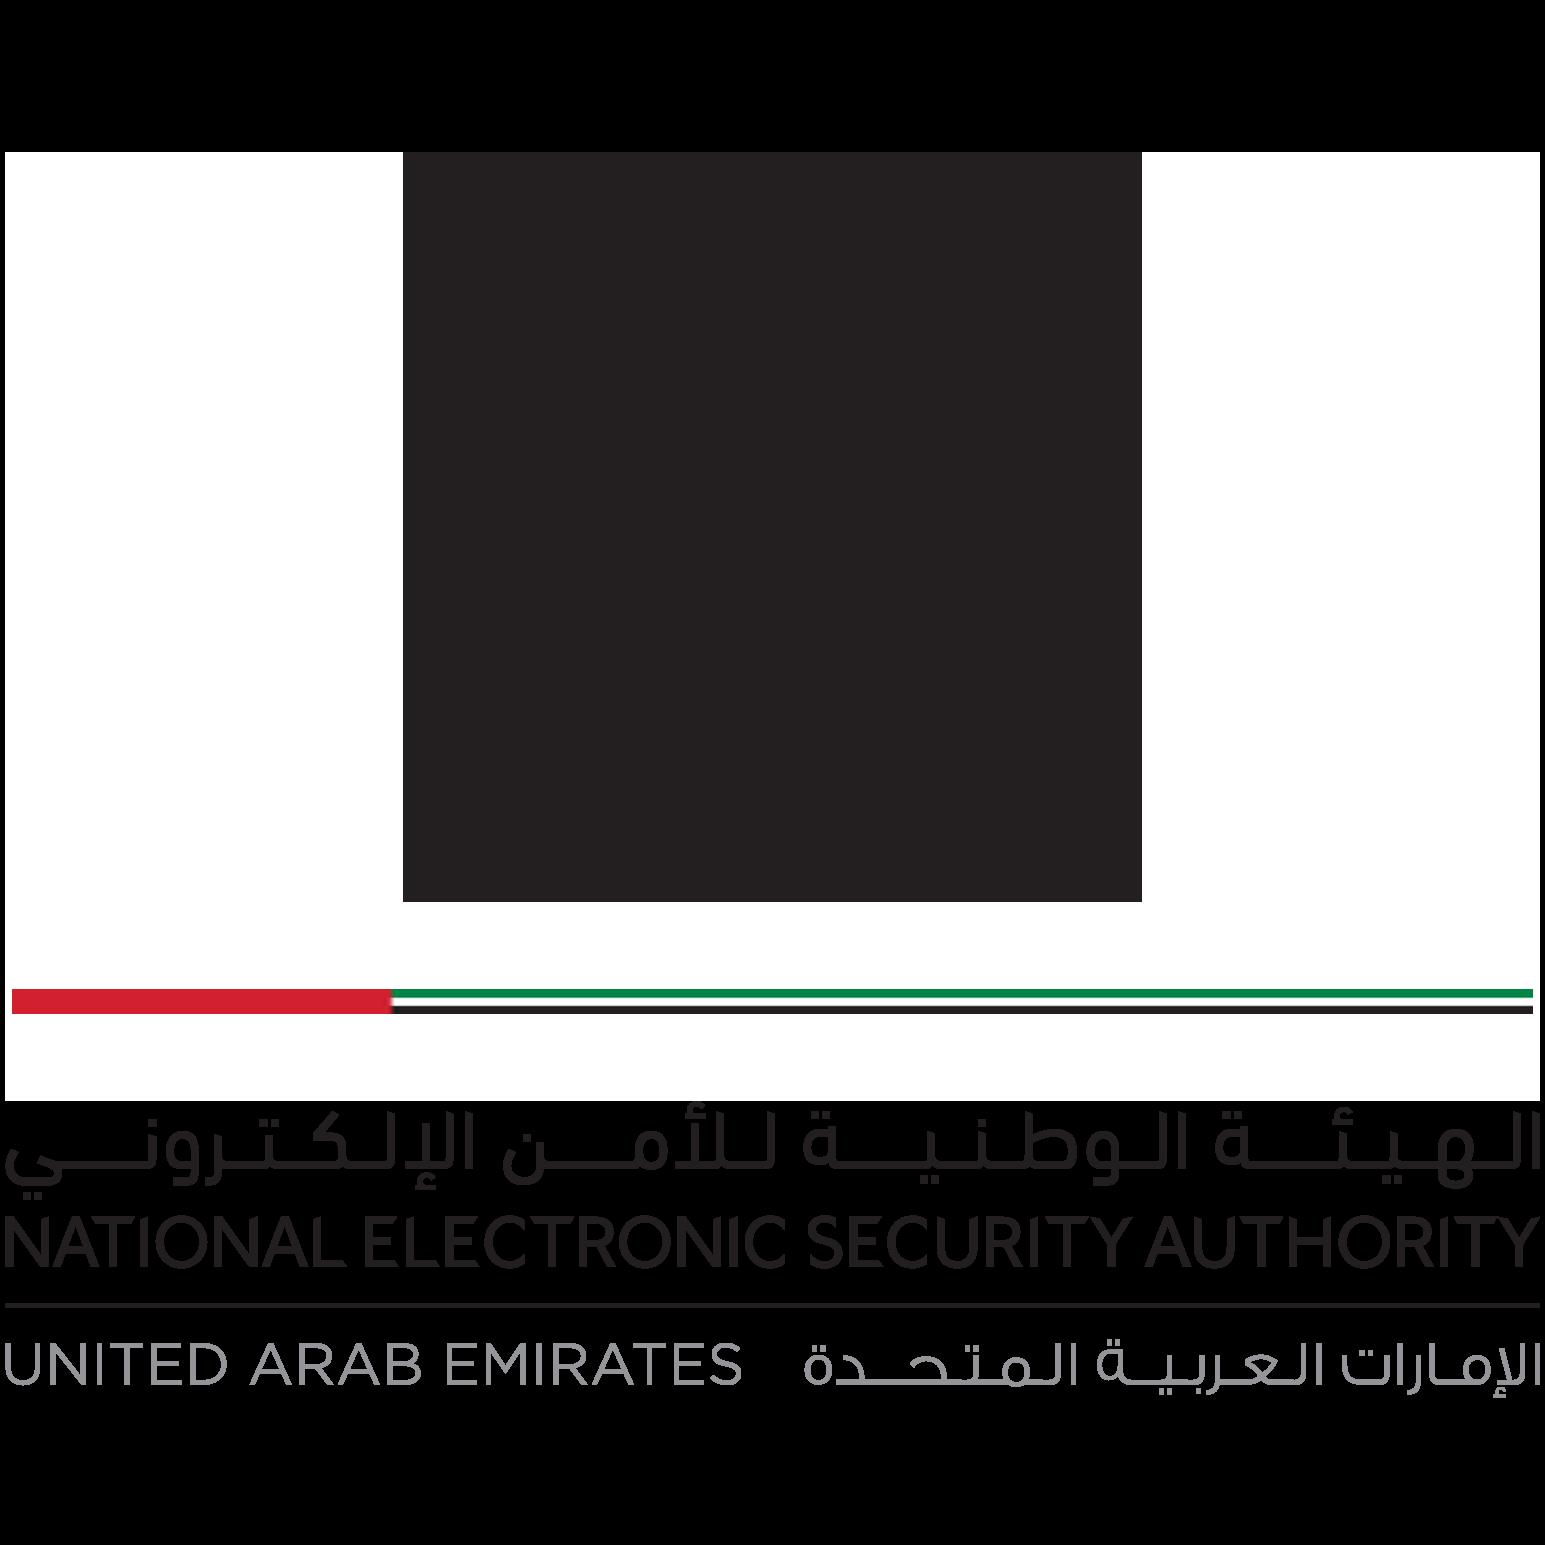 UAE Information Assurance (IA) Assessment